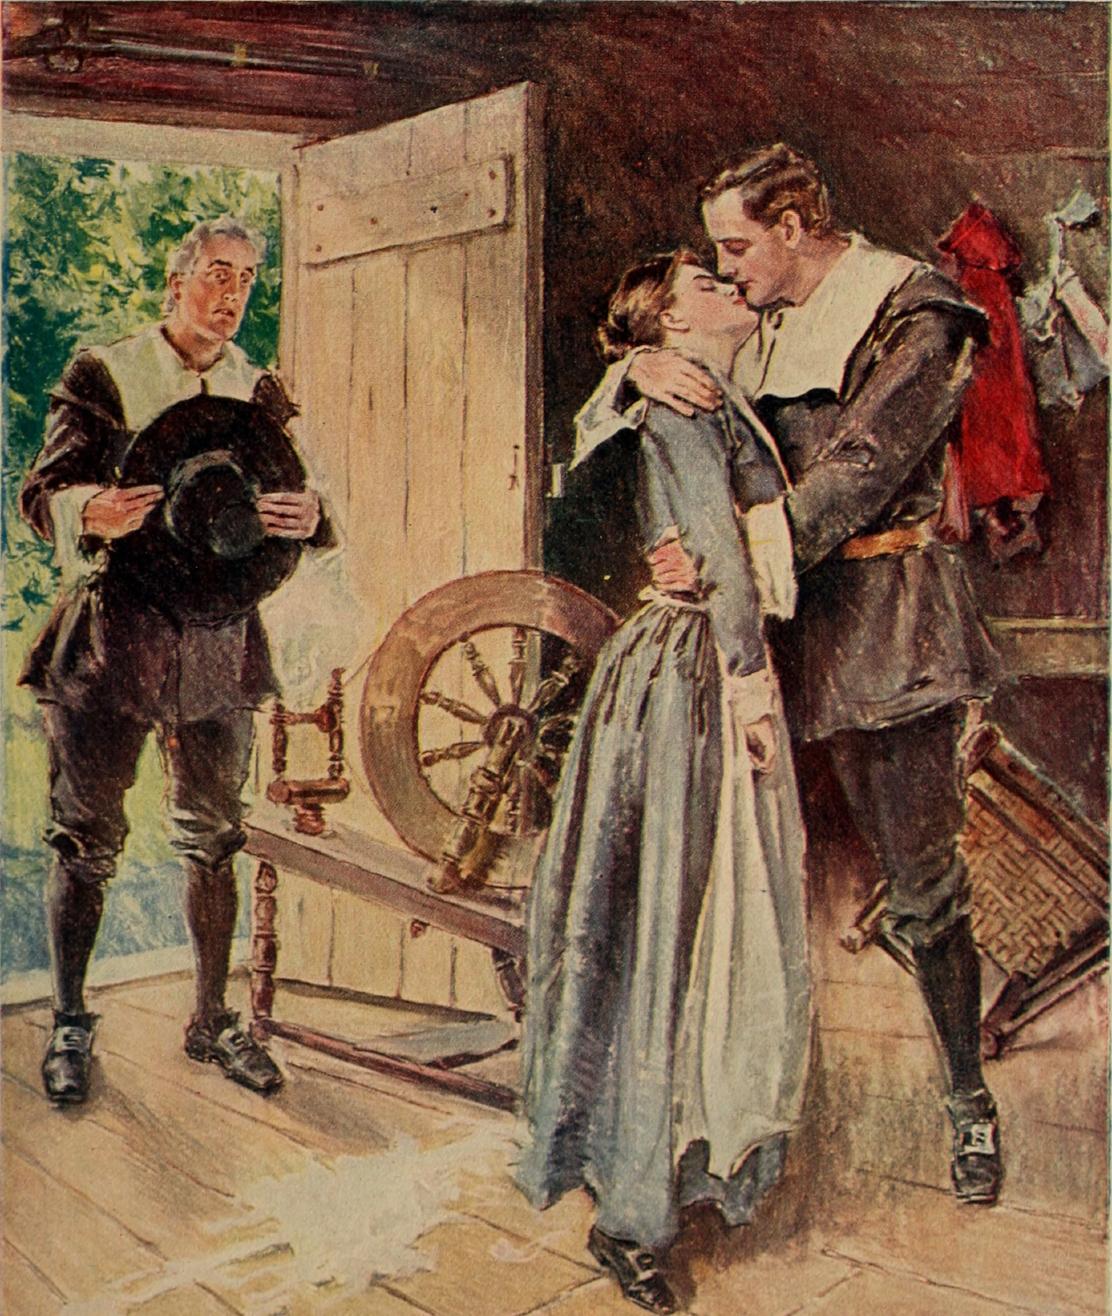 Courtship_of_Miles_Standish_(1903)_(14757131396).jpg